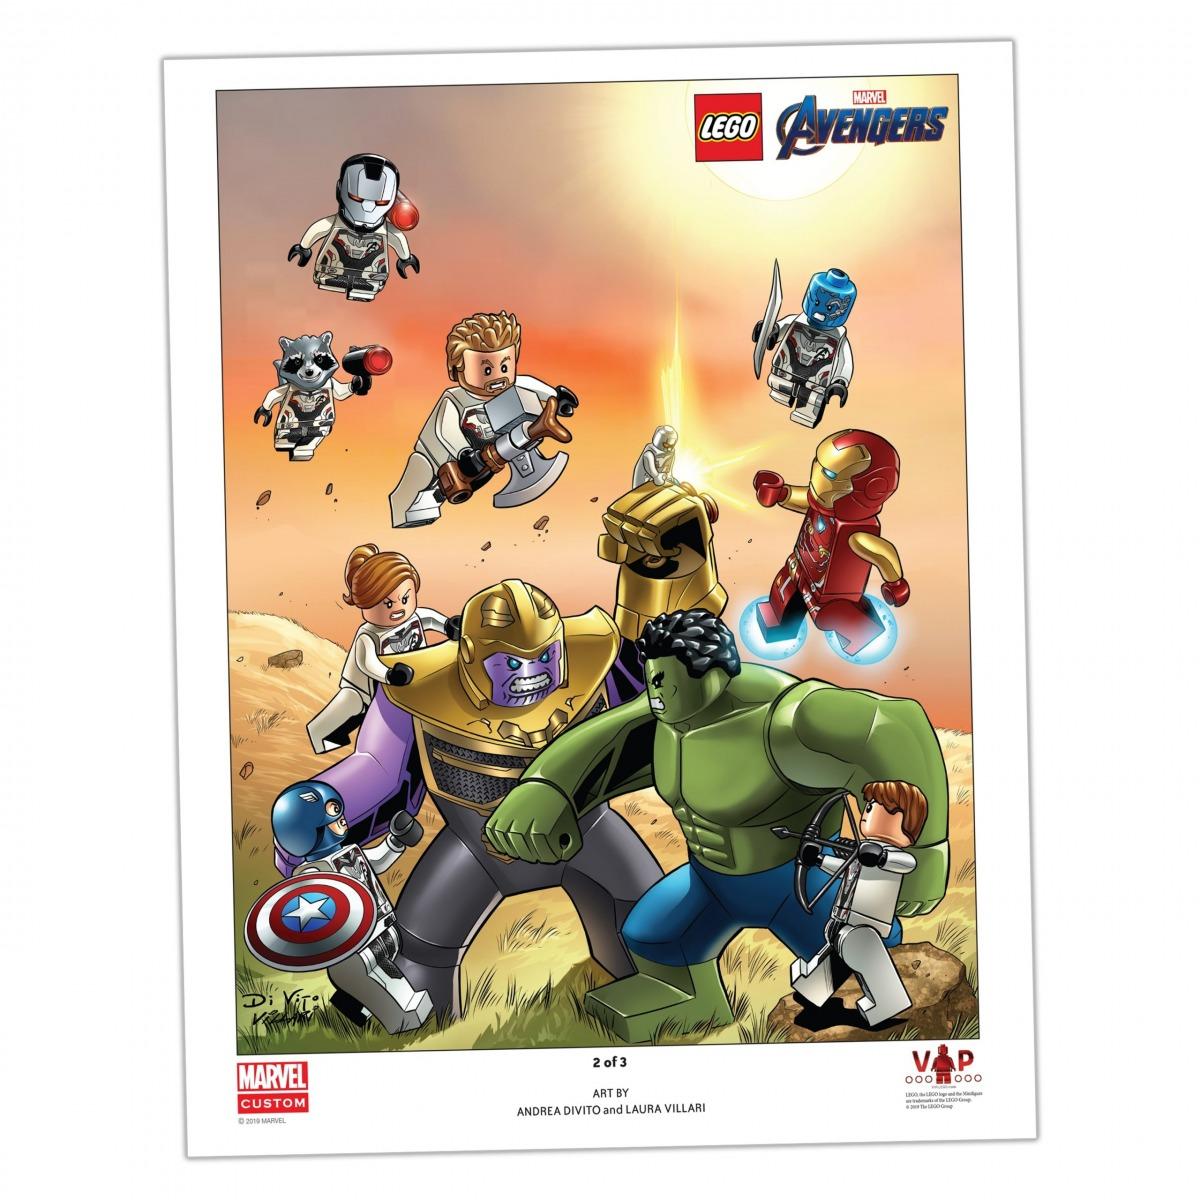 5005881 official lego 5005881 shop se scaled